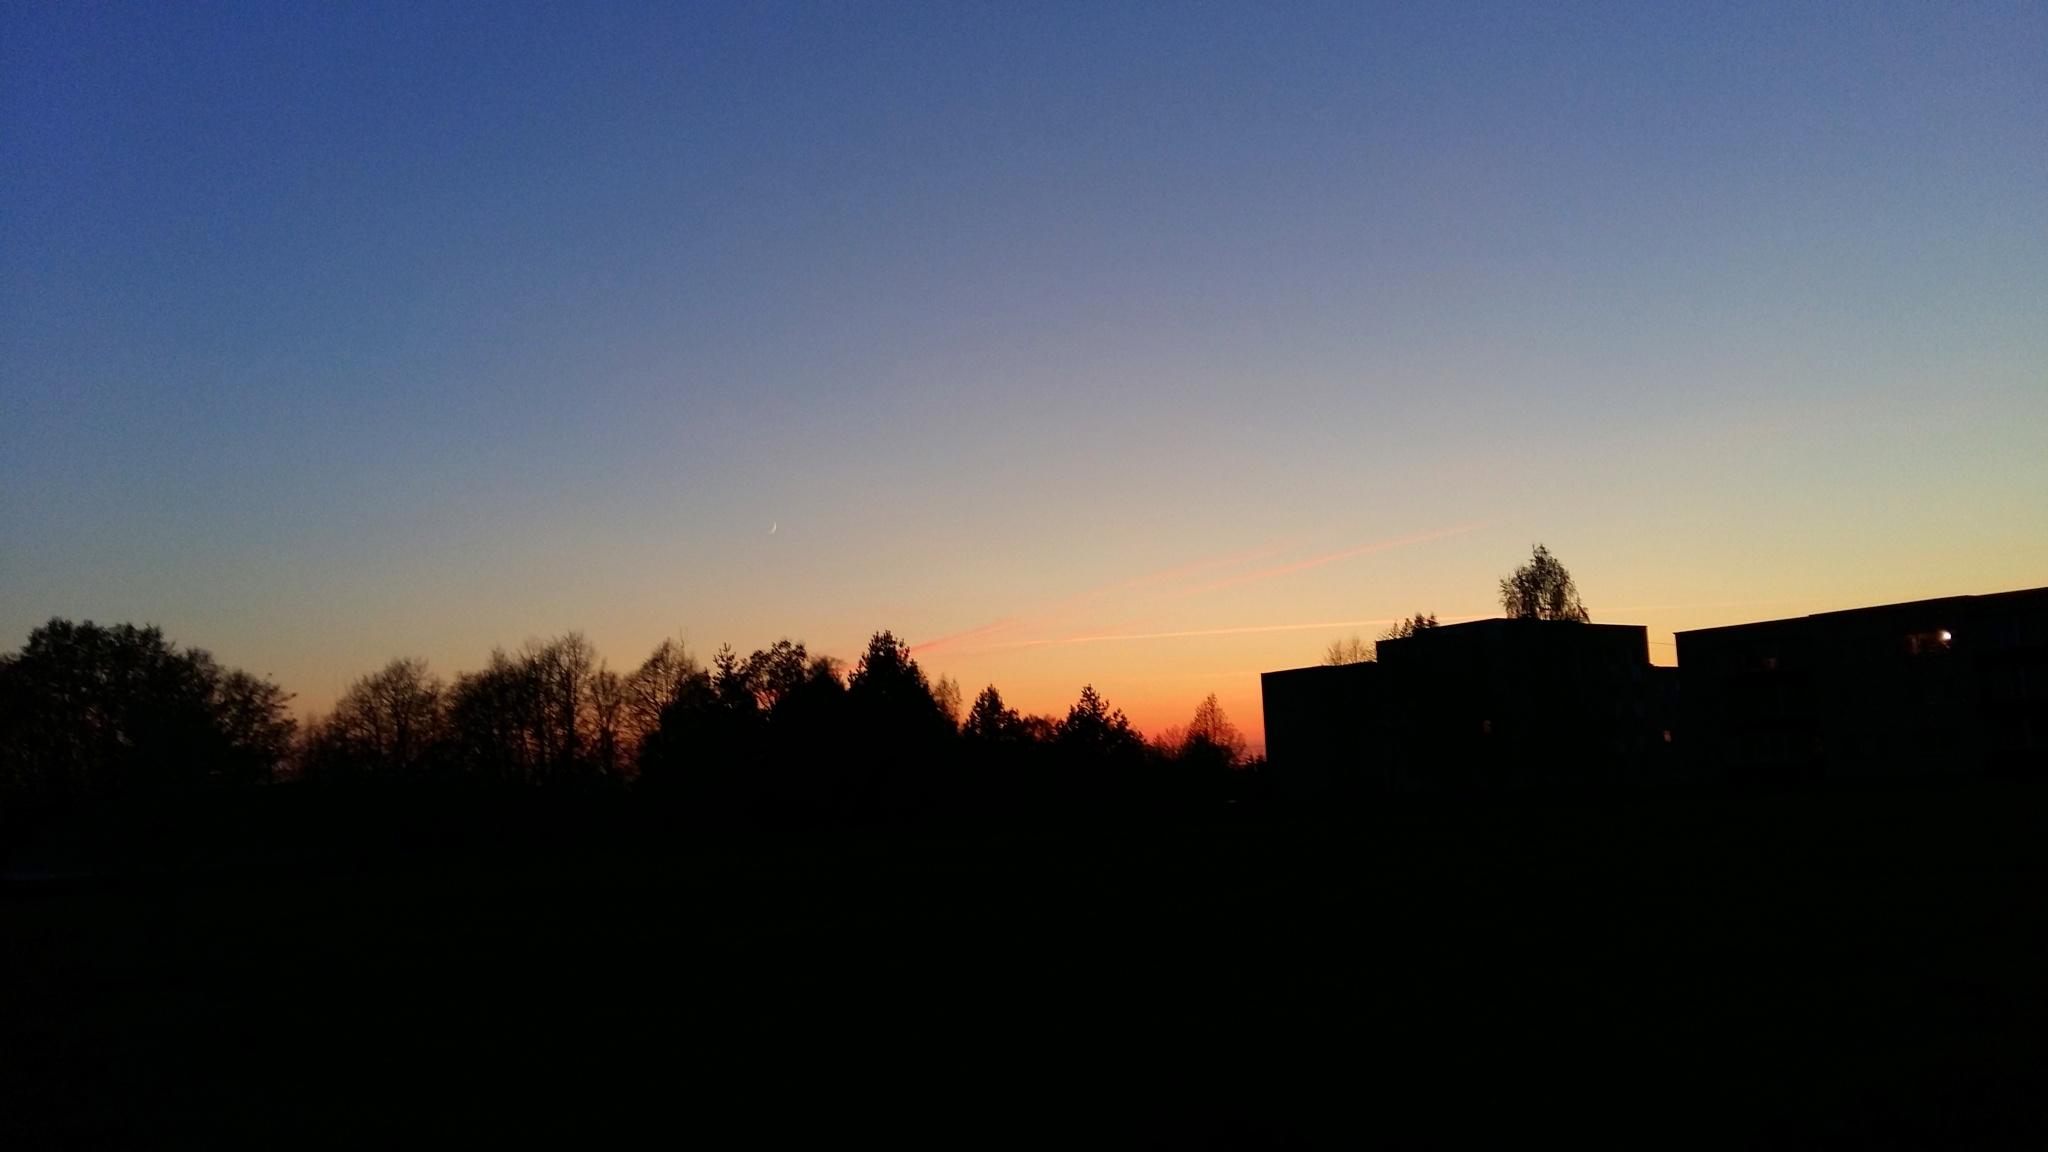 Evening . by uzkuraitiene62